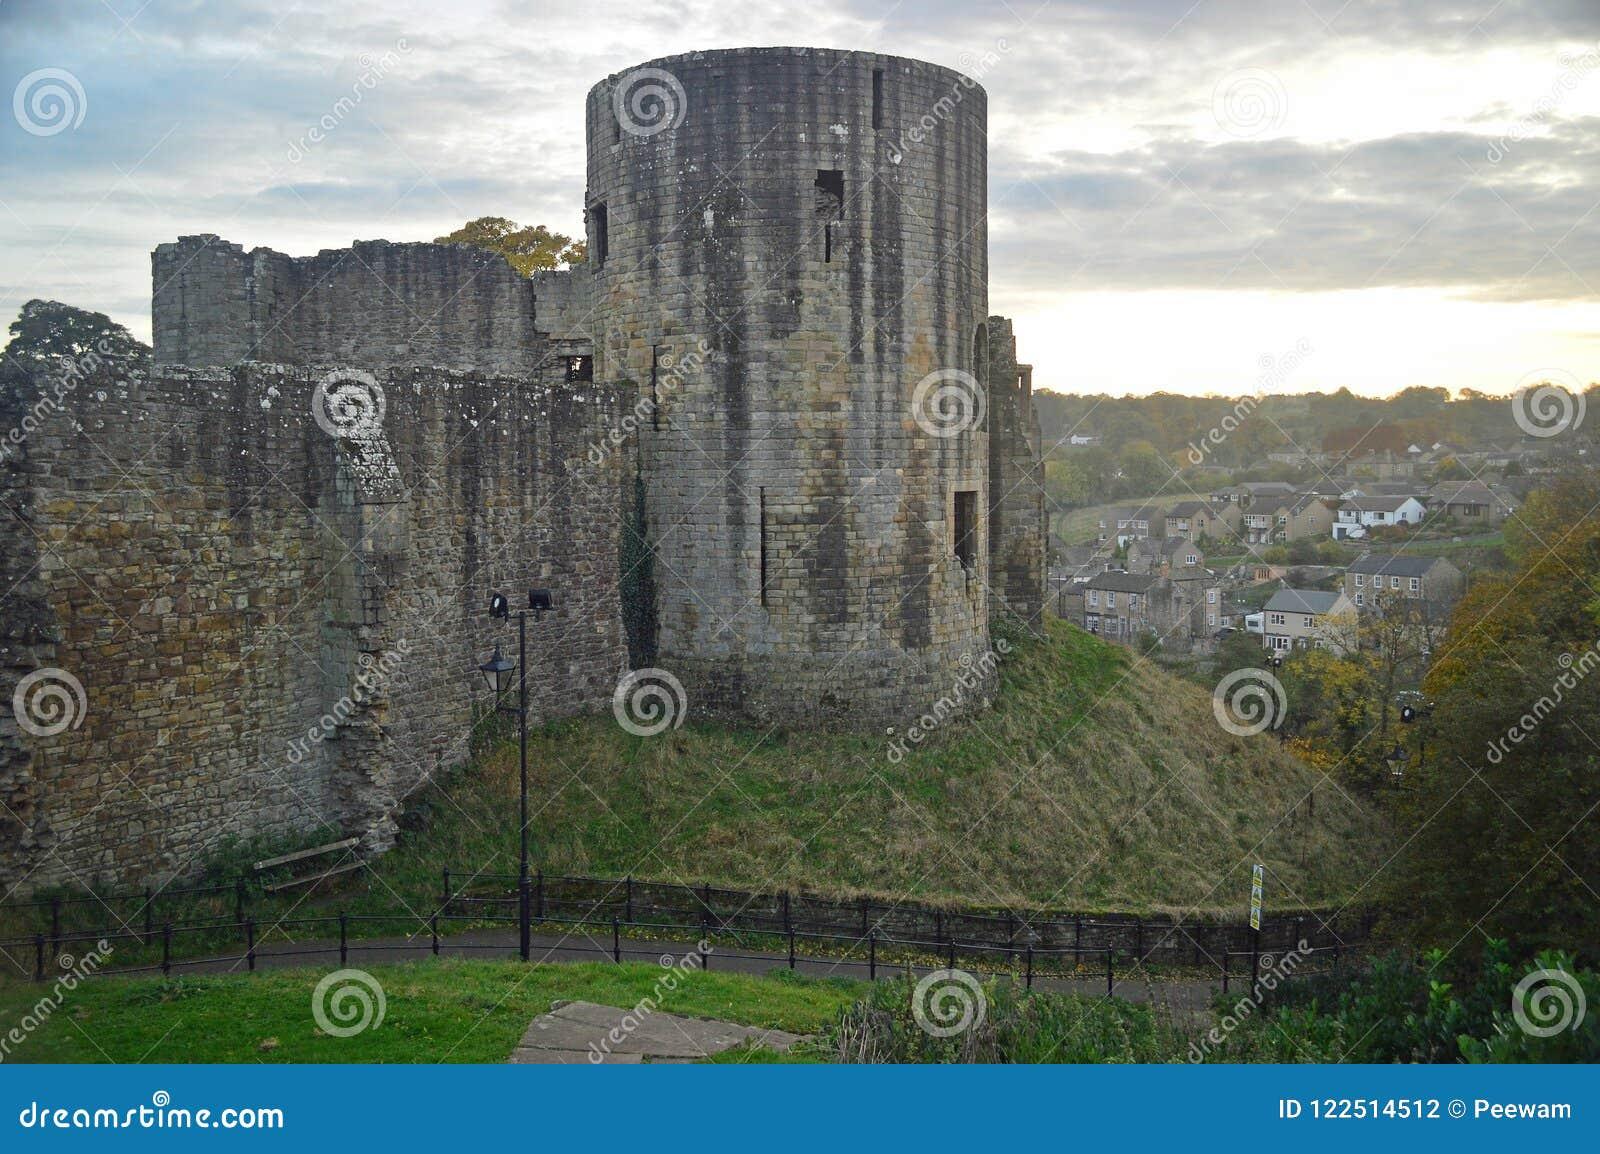 The ruins of Barnard Castle